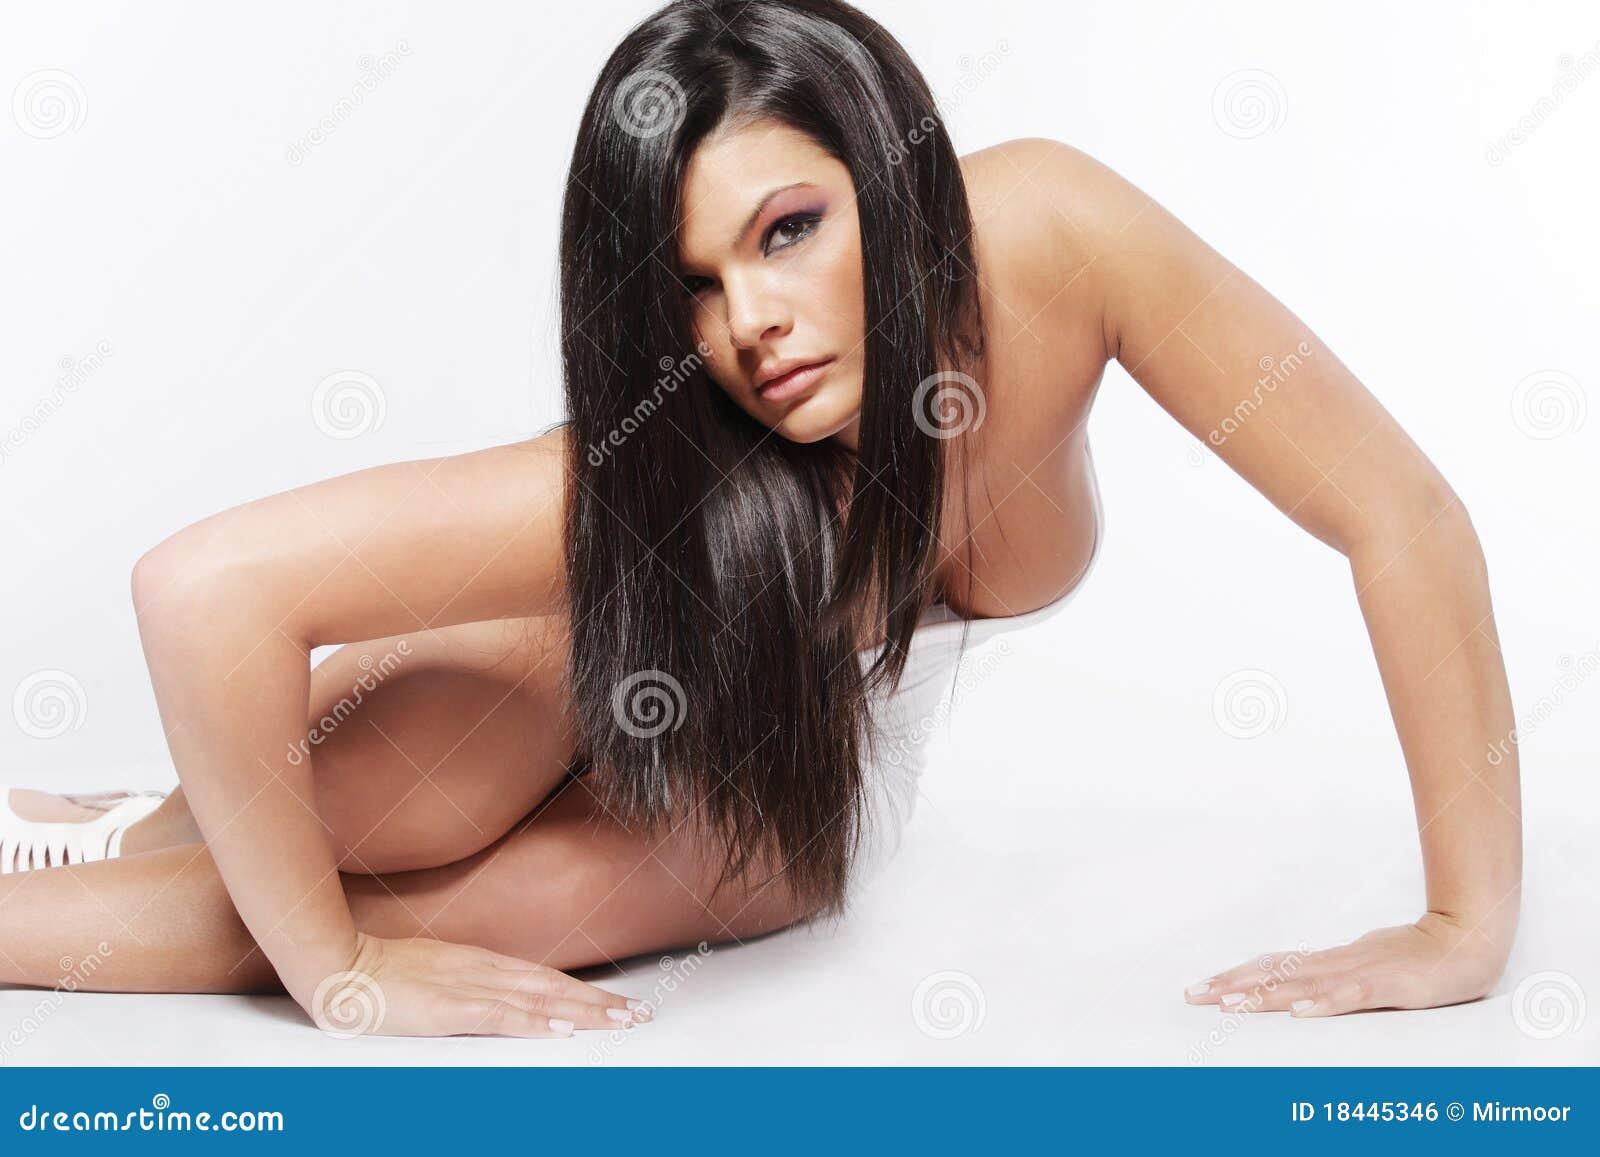 junge attraktive frau mit dem langen schwarzen haar. Black Bedroom Furniture Sets. Home Design Ideas